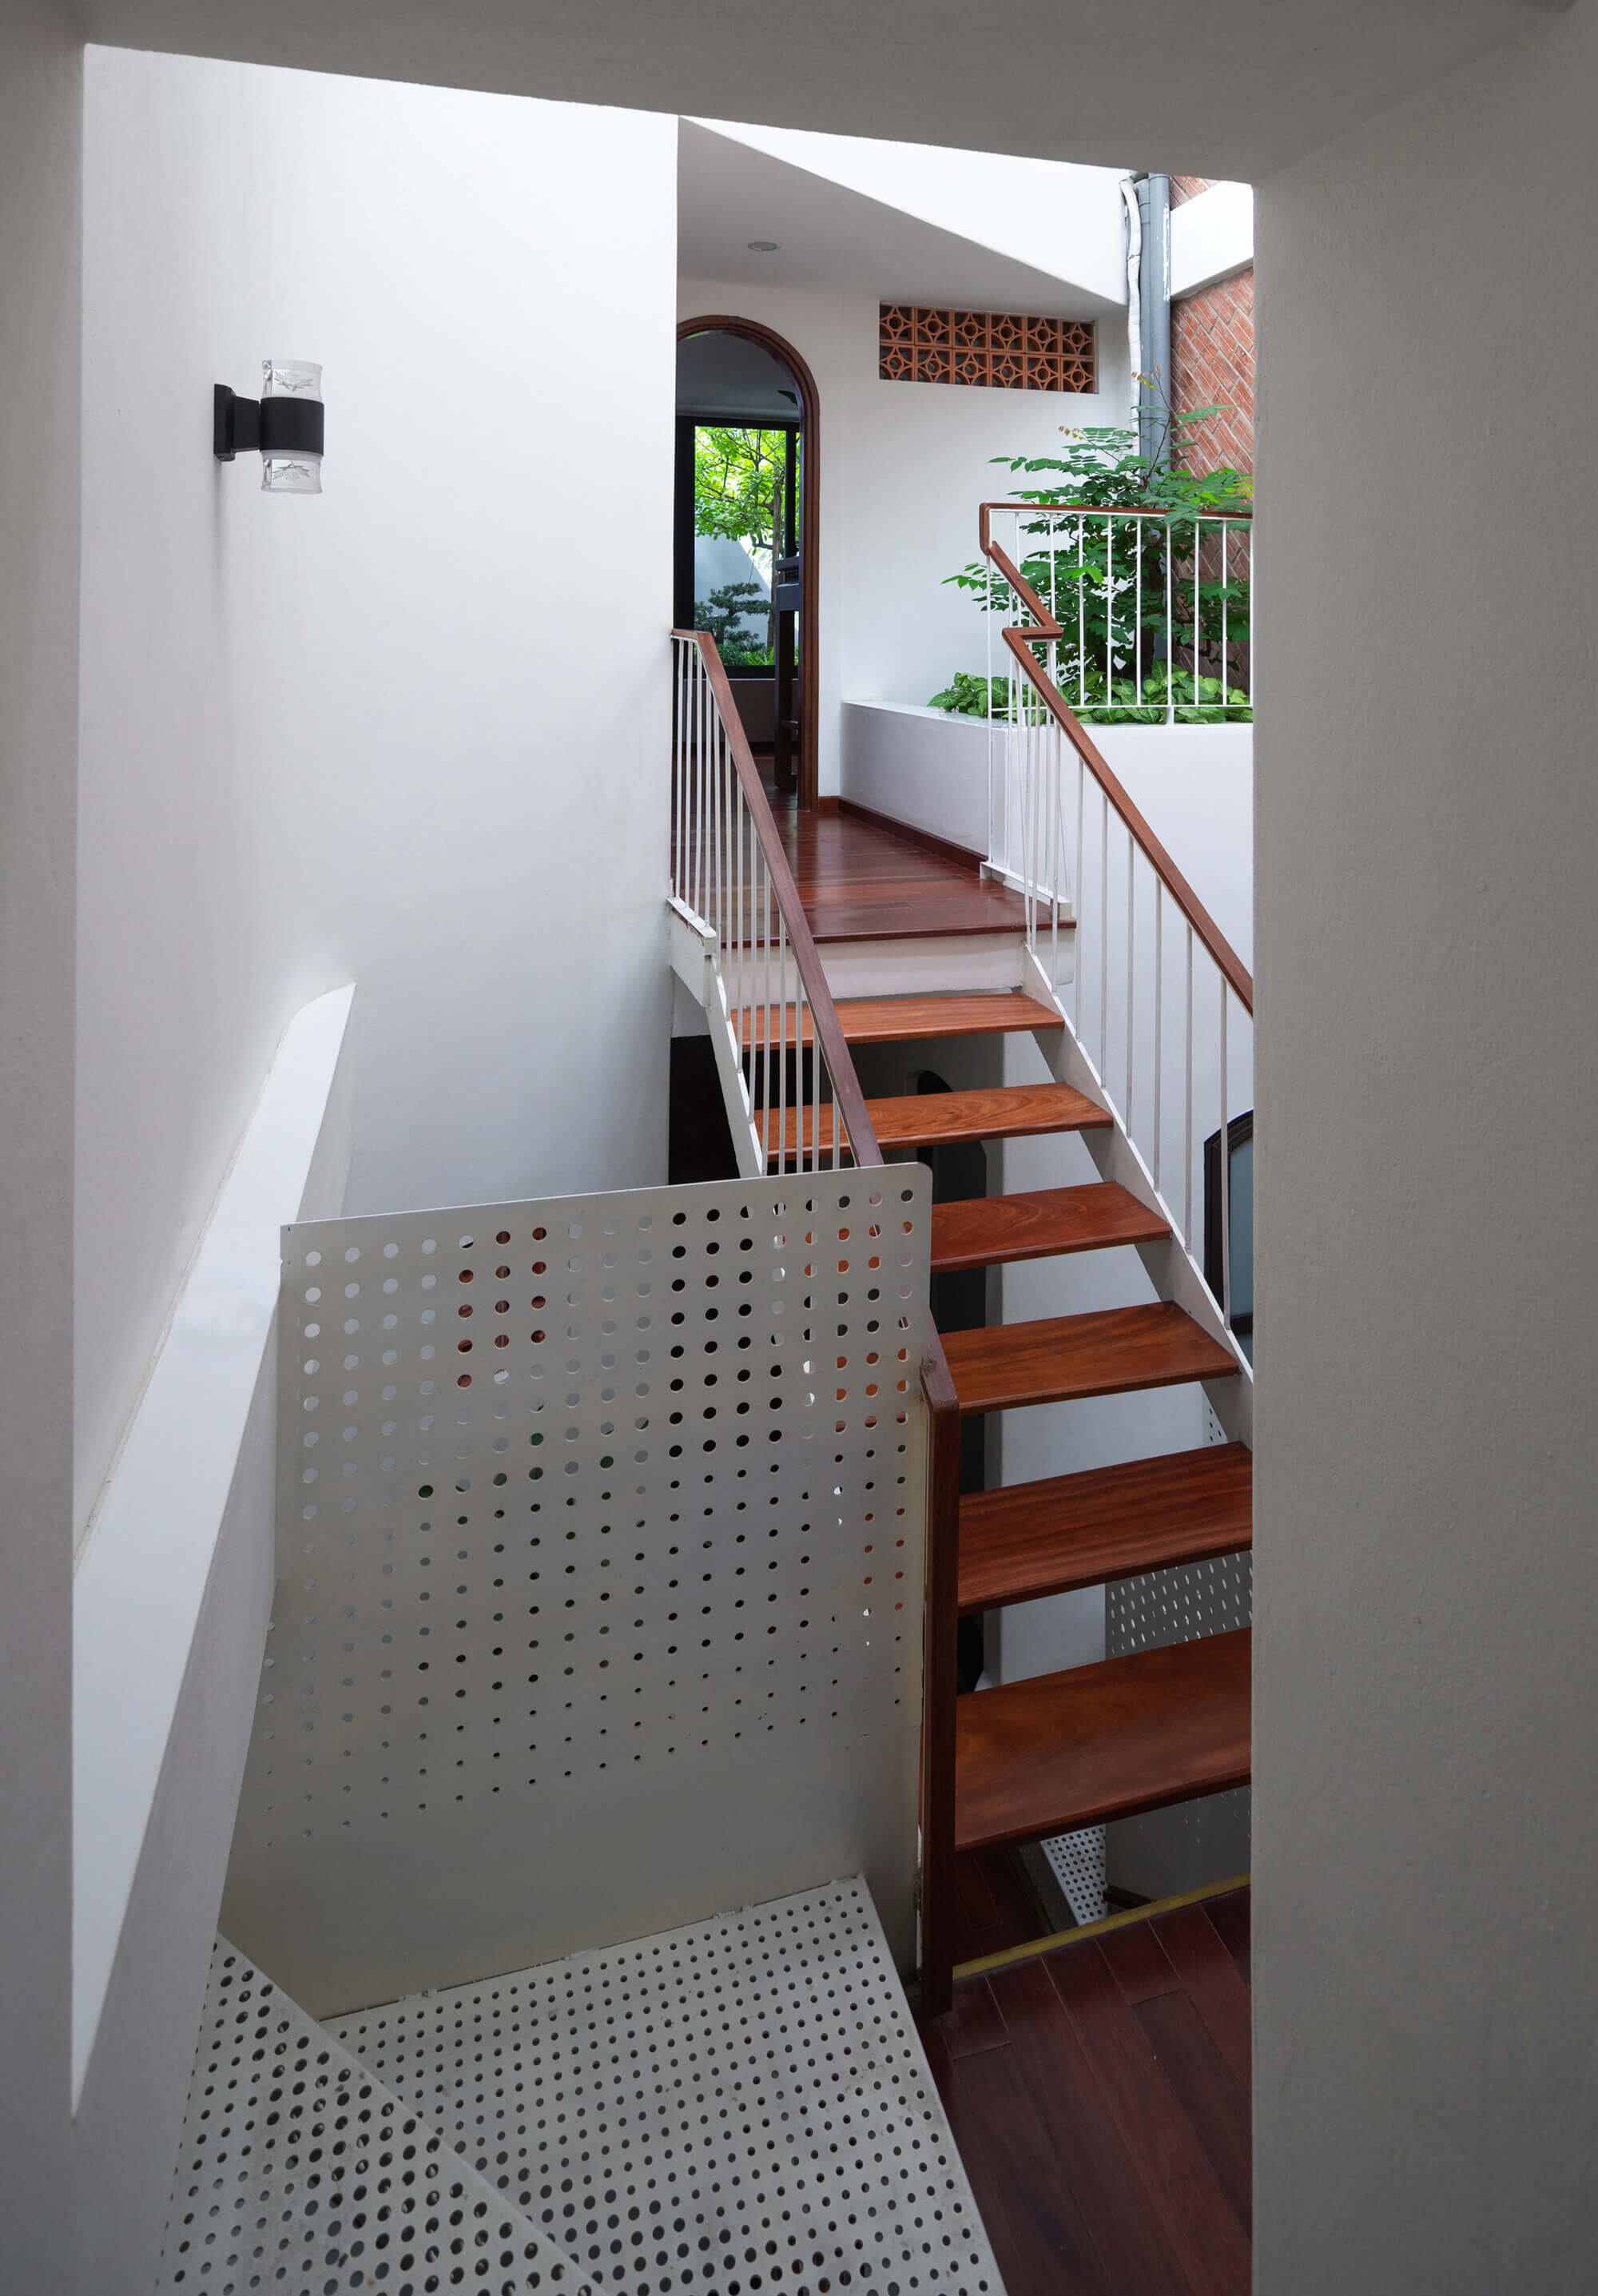 Đại-Kim-house-Aline-Architect-Vietnam-15